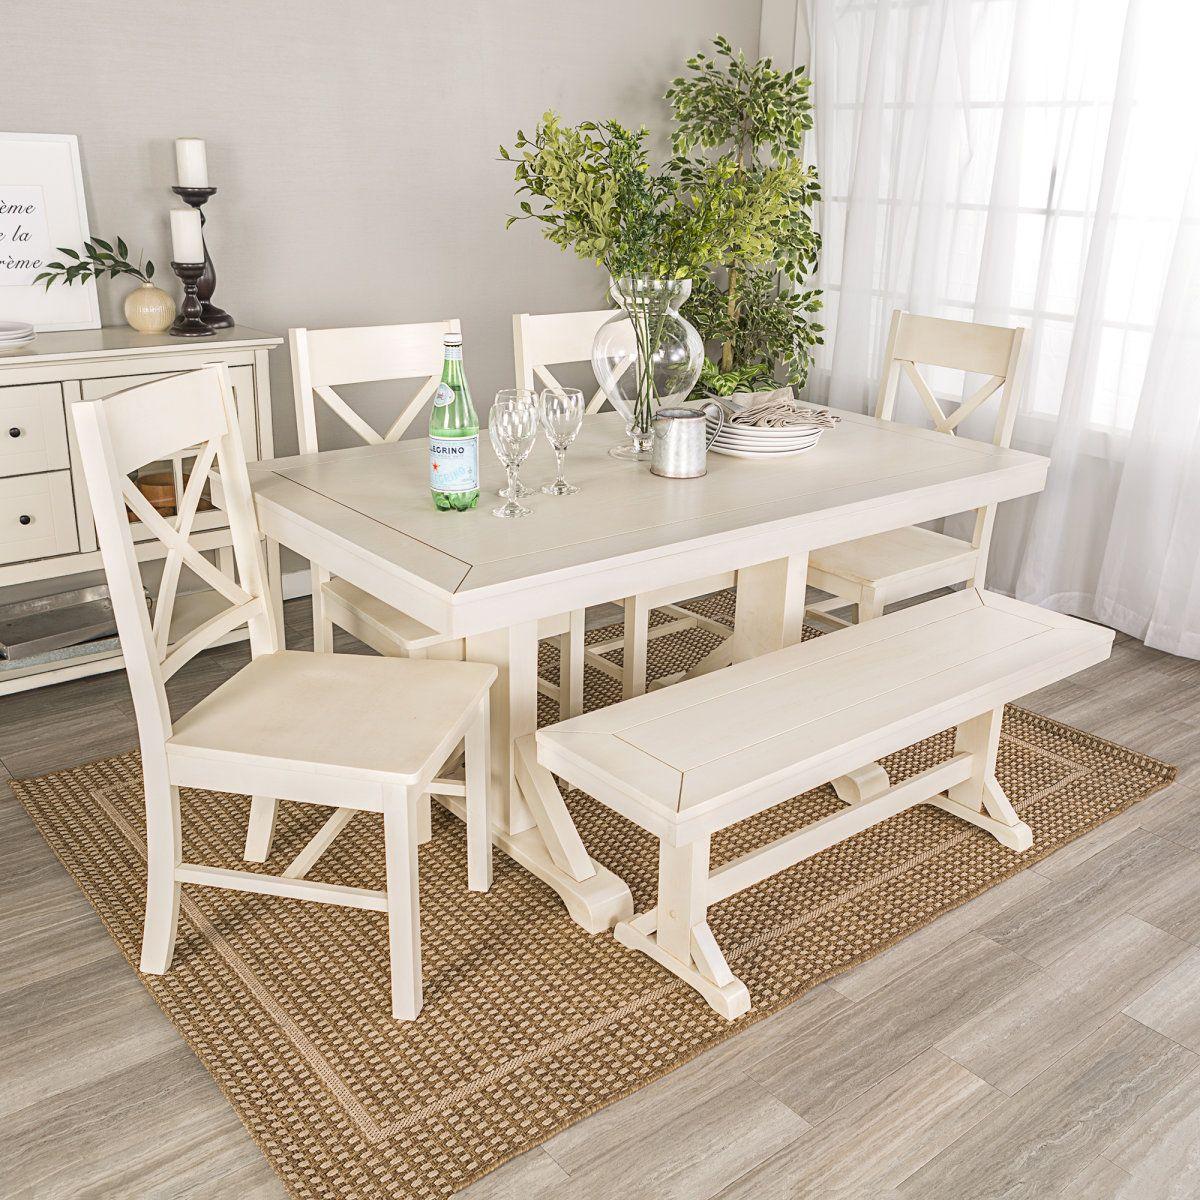 6 Piece Antiqued Wood Dining Set Furniture Black Dining Room Furniture Cottage Furniture